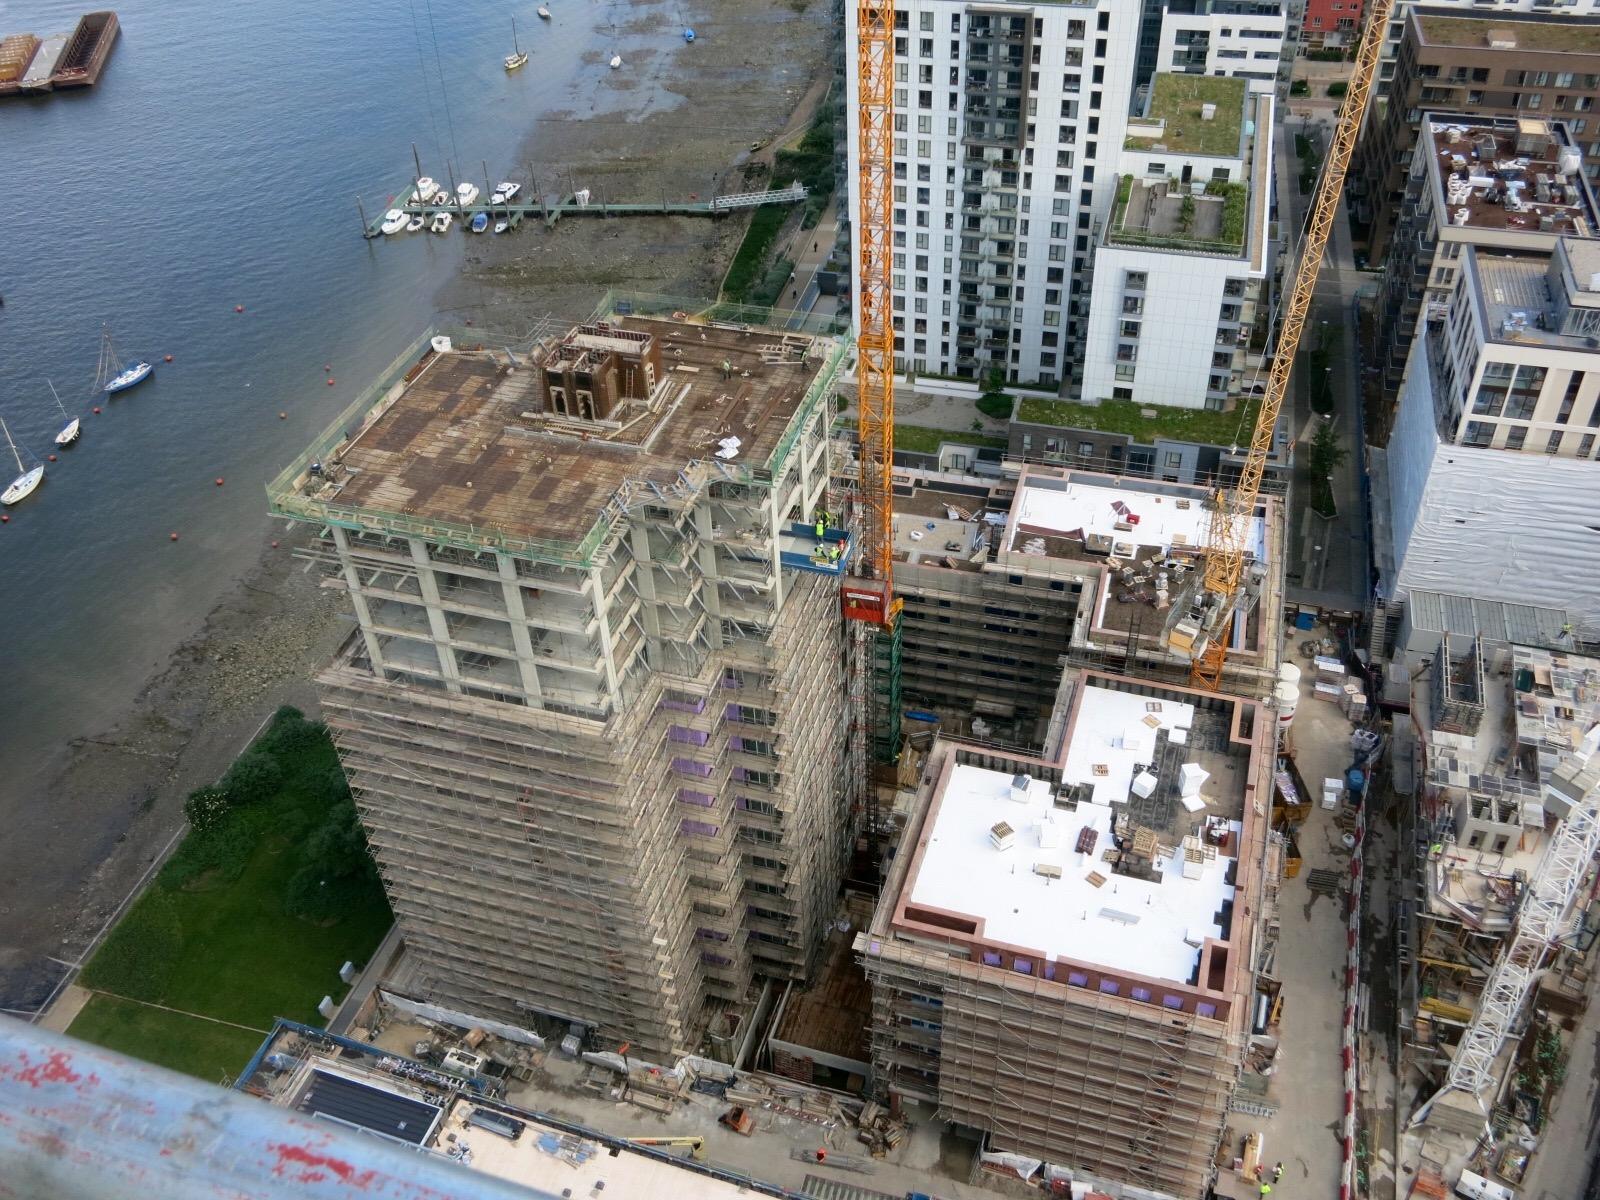 View over Lighterman development from roof of neighbouring Waterman, June 2016 [greenpen.london]